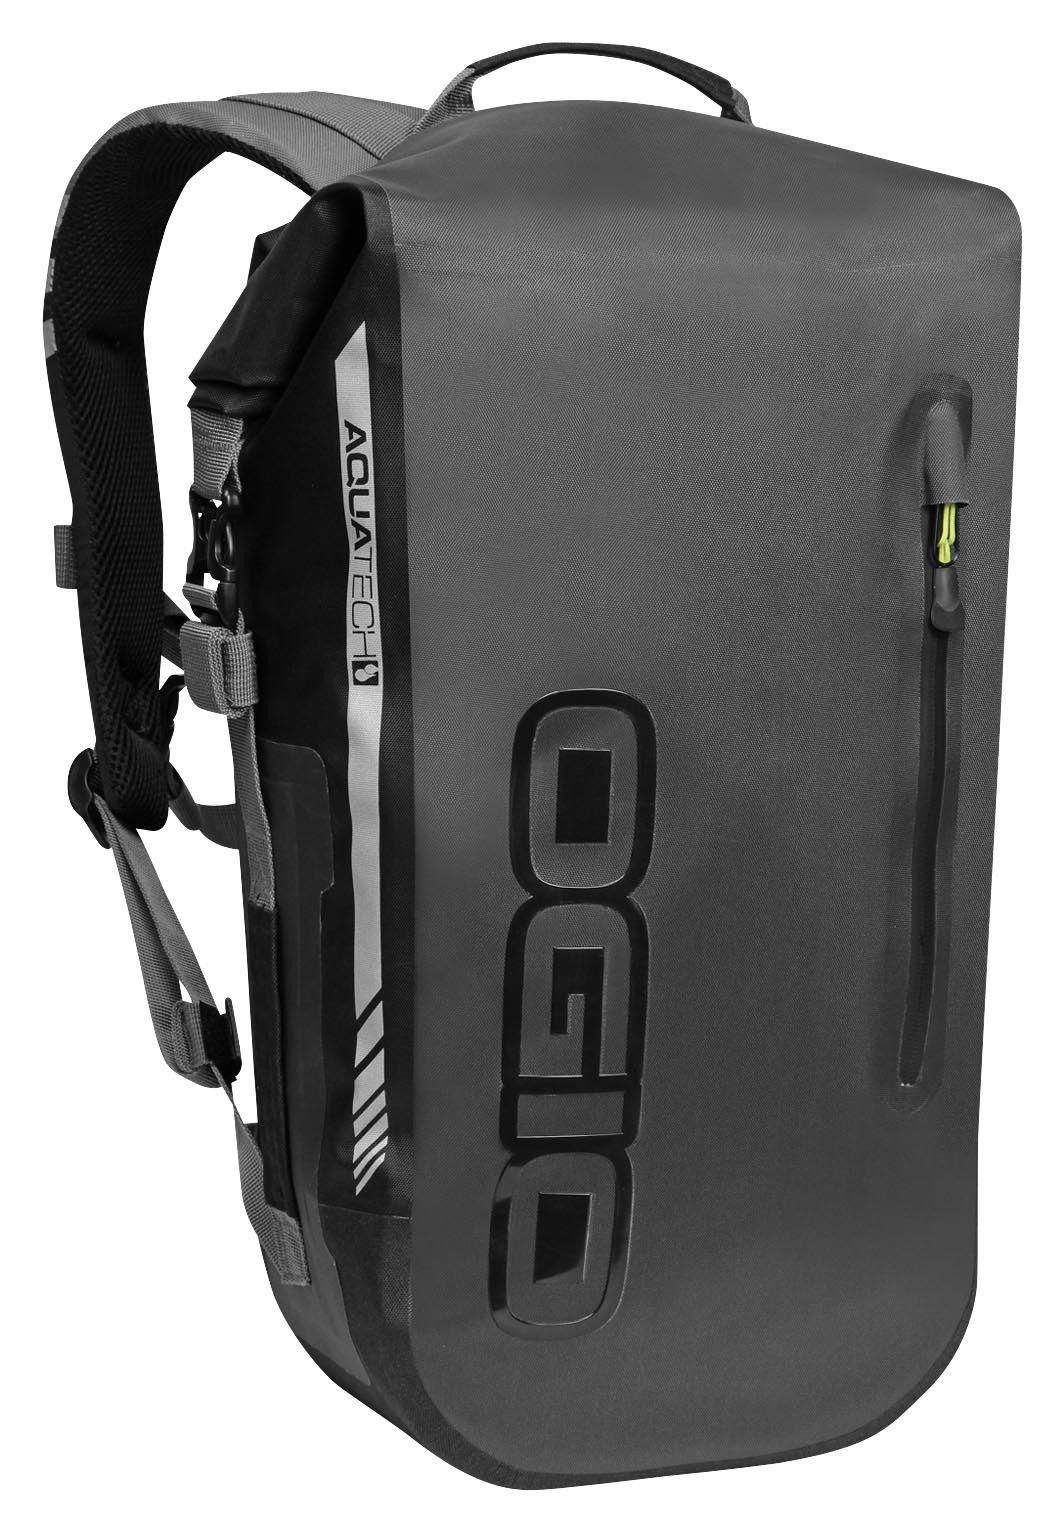 OGIO No Drag Mach 5 Backpack - Cycle Gear dcde76ff3f5bd